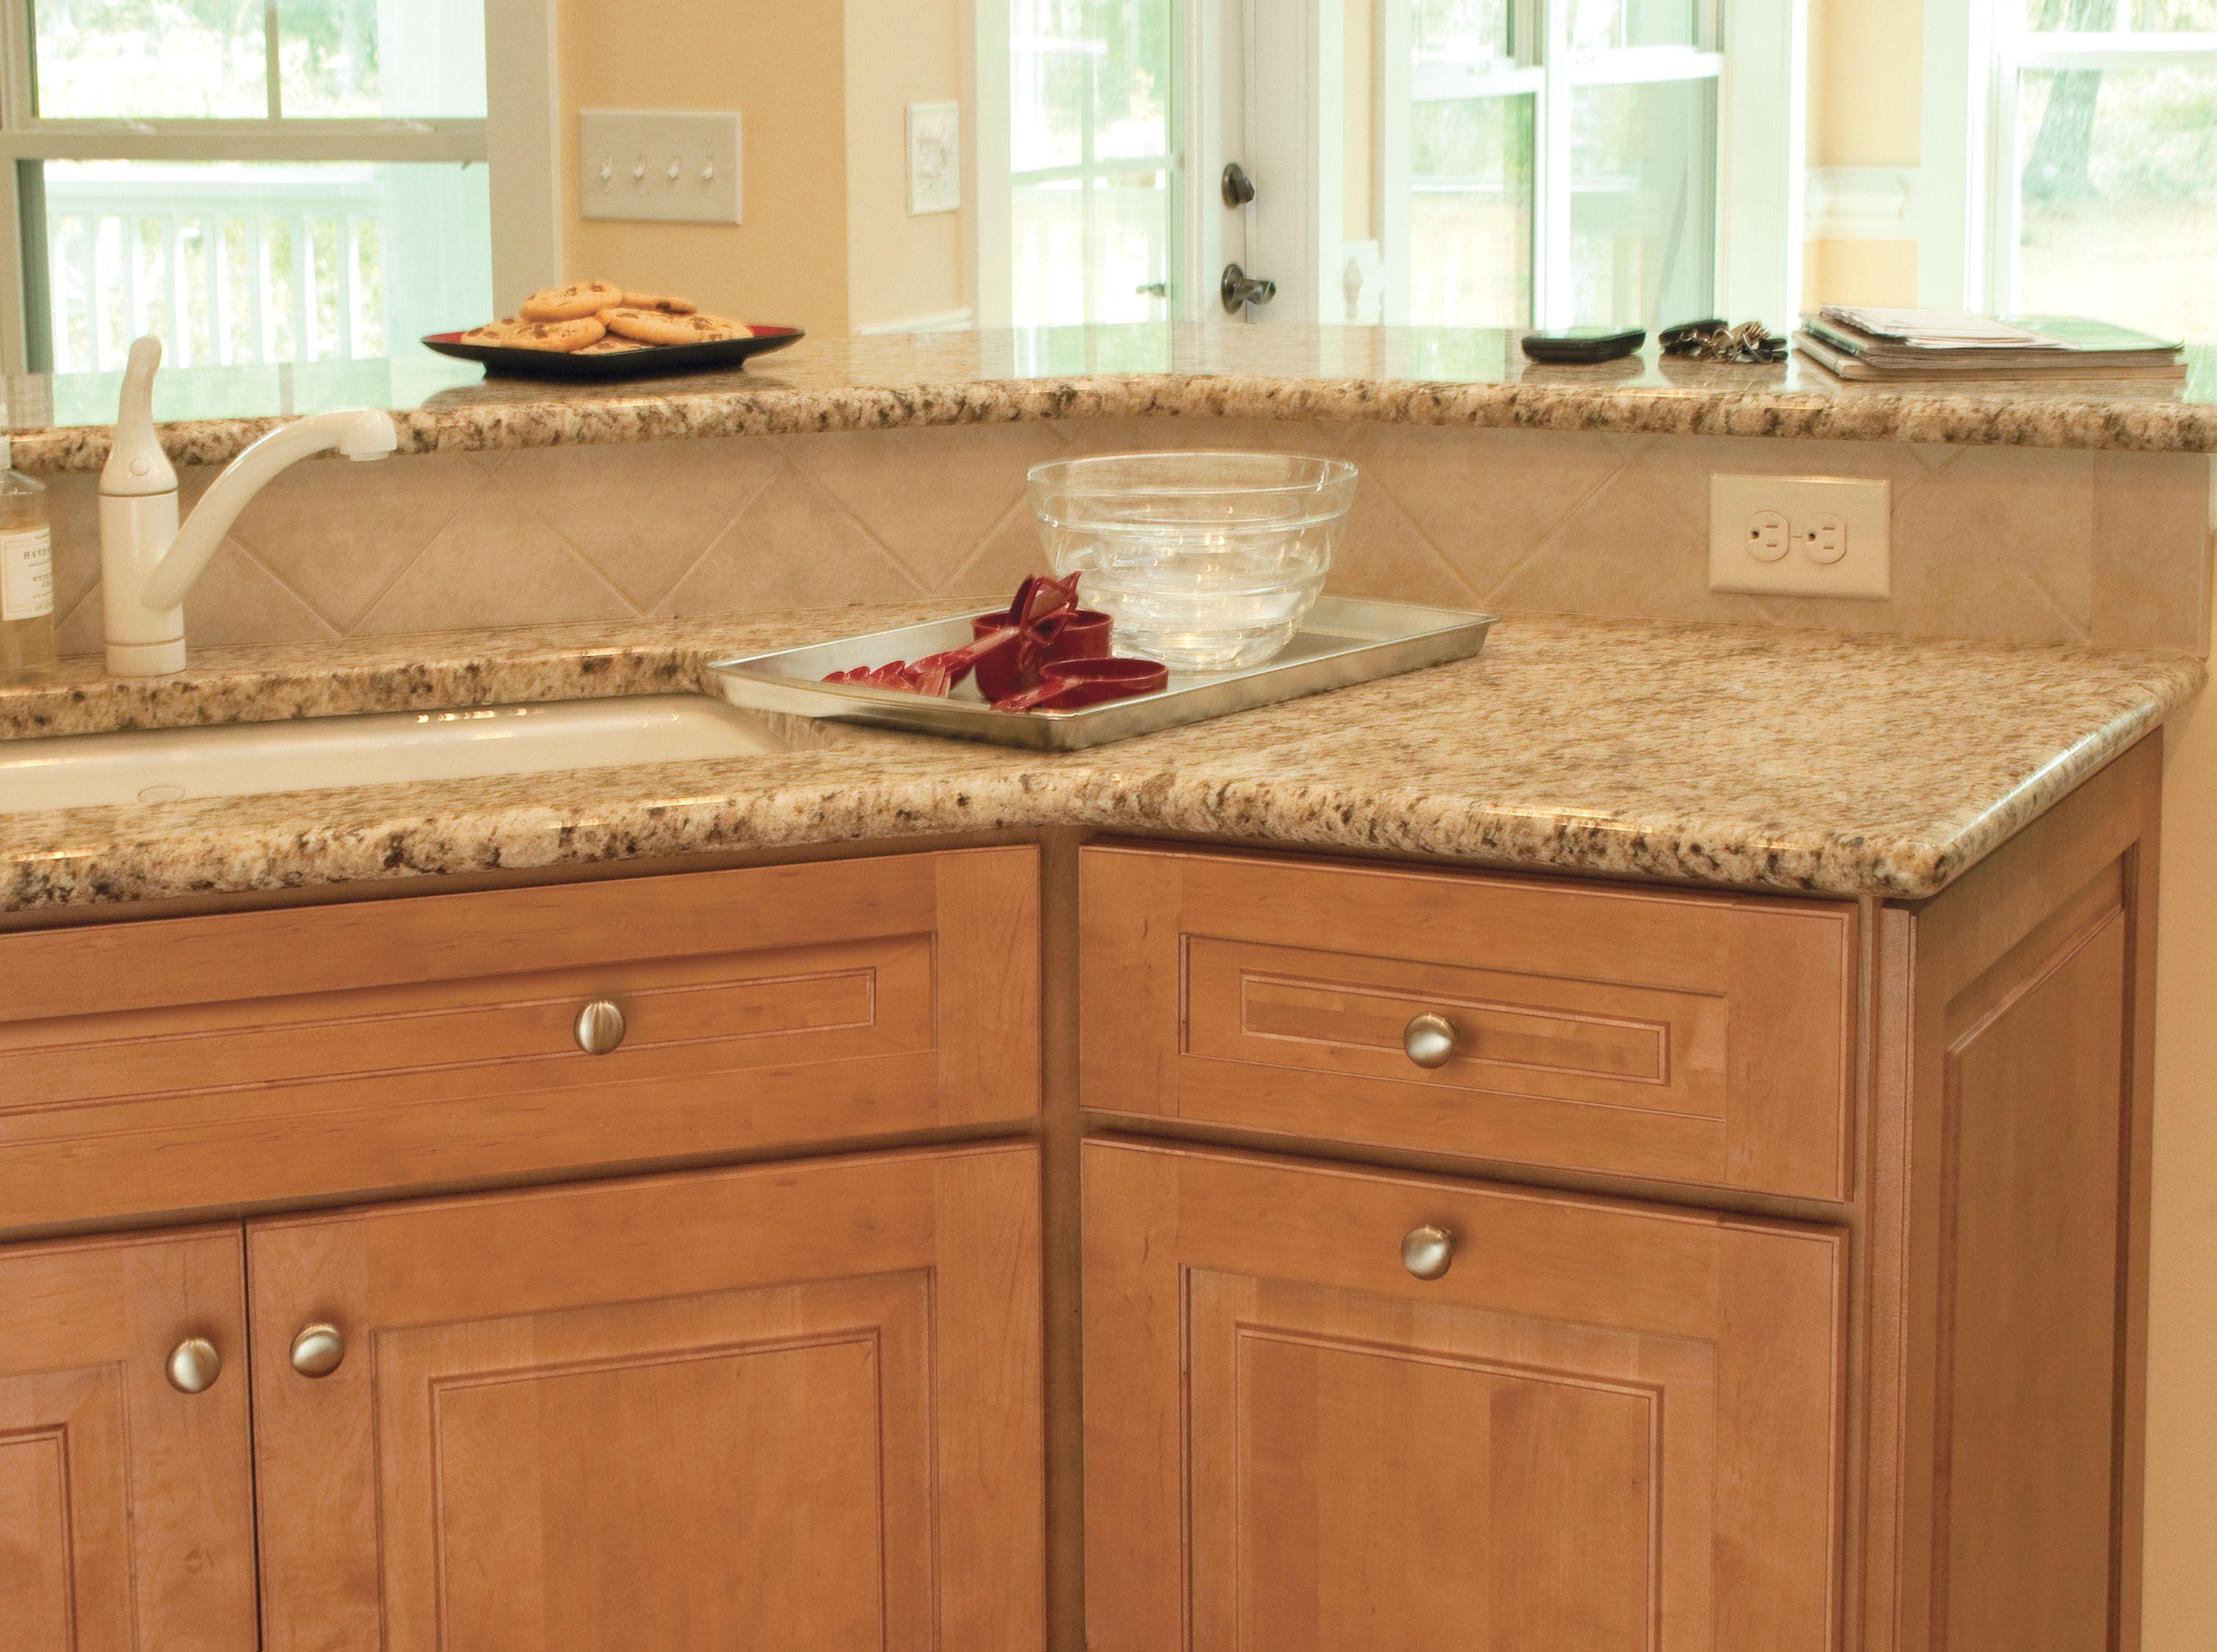 Cambridge Maple Caramel Cabinets Kitchen Kitchen Cabinets Maple